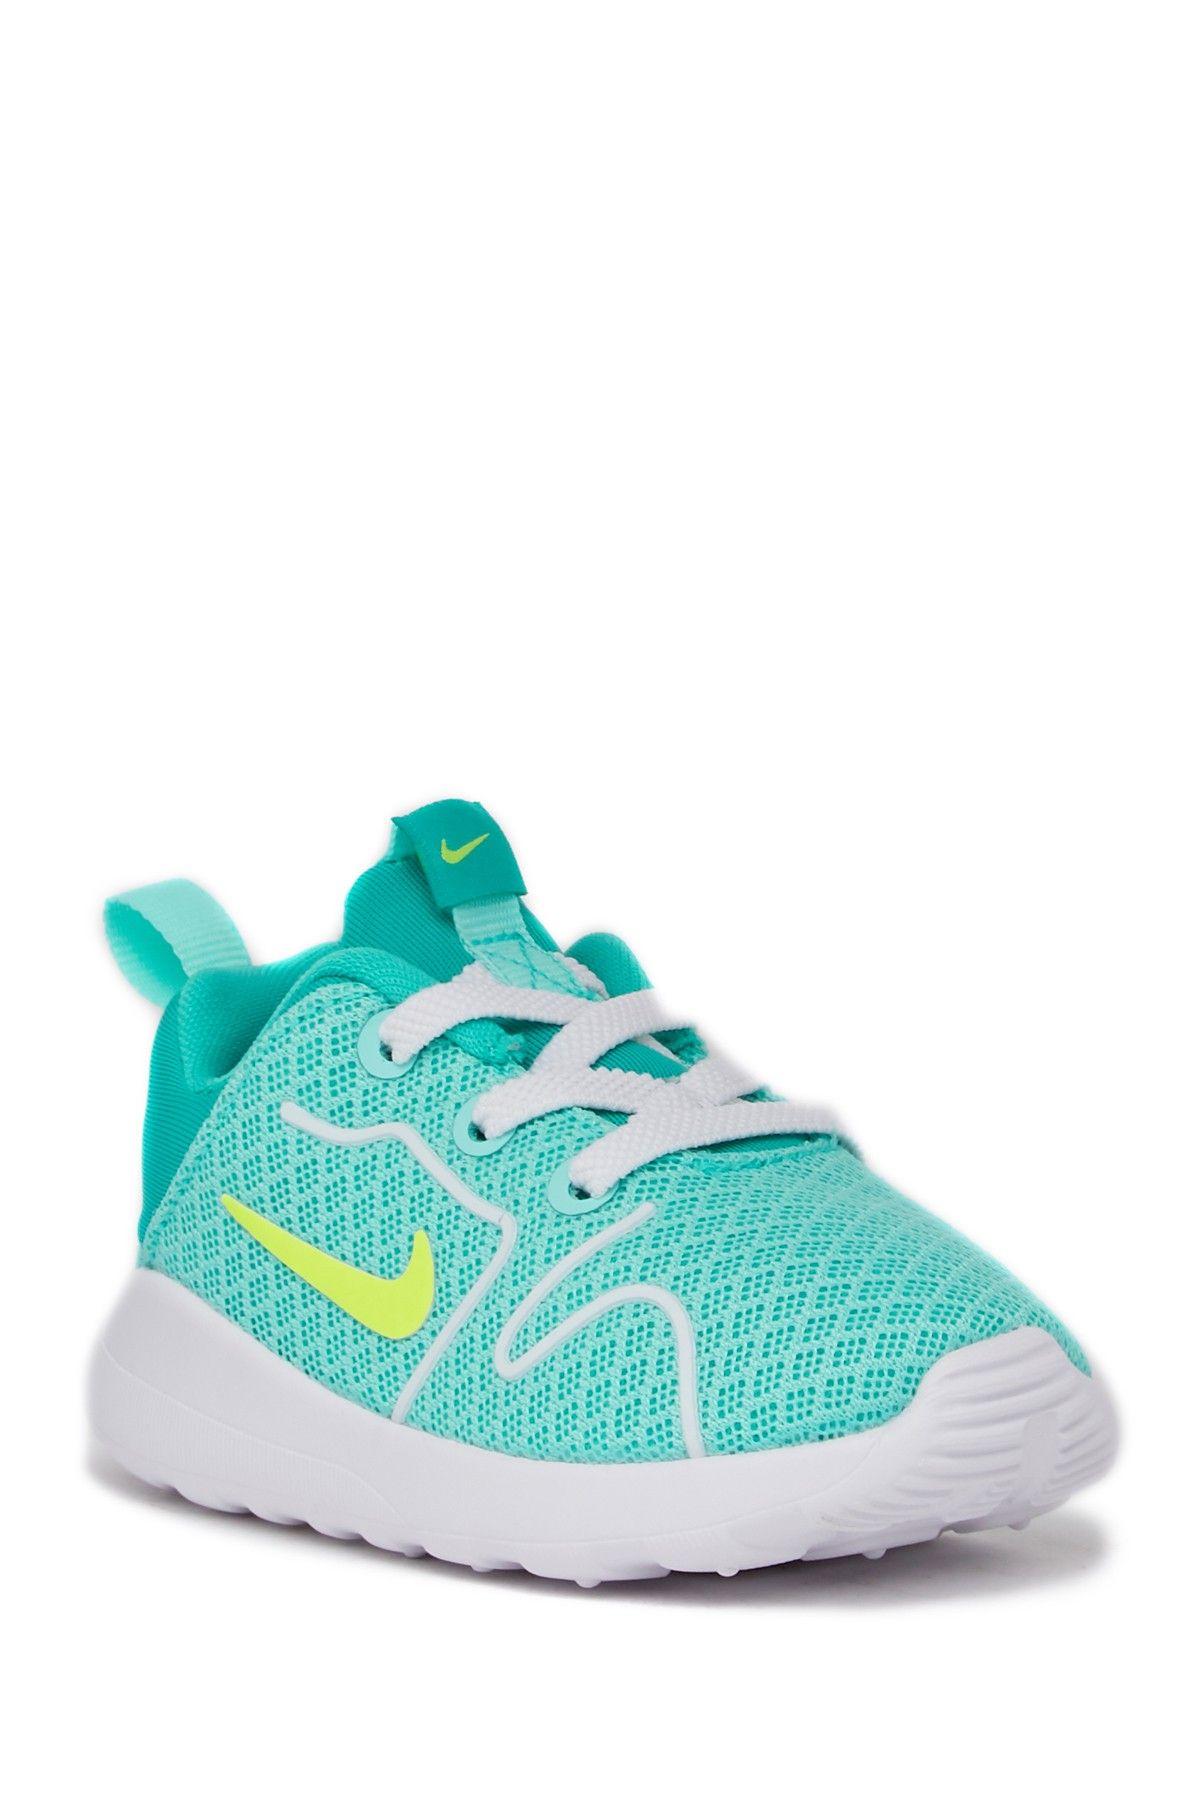 separation shoes 4e386 6b9e2 ... canada kaishi 2.0 sneaker toddler 14c66 e35a3